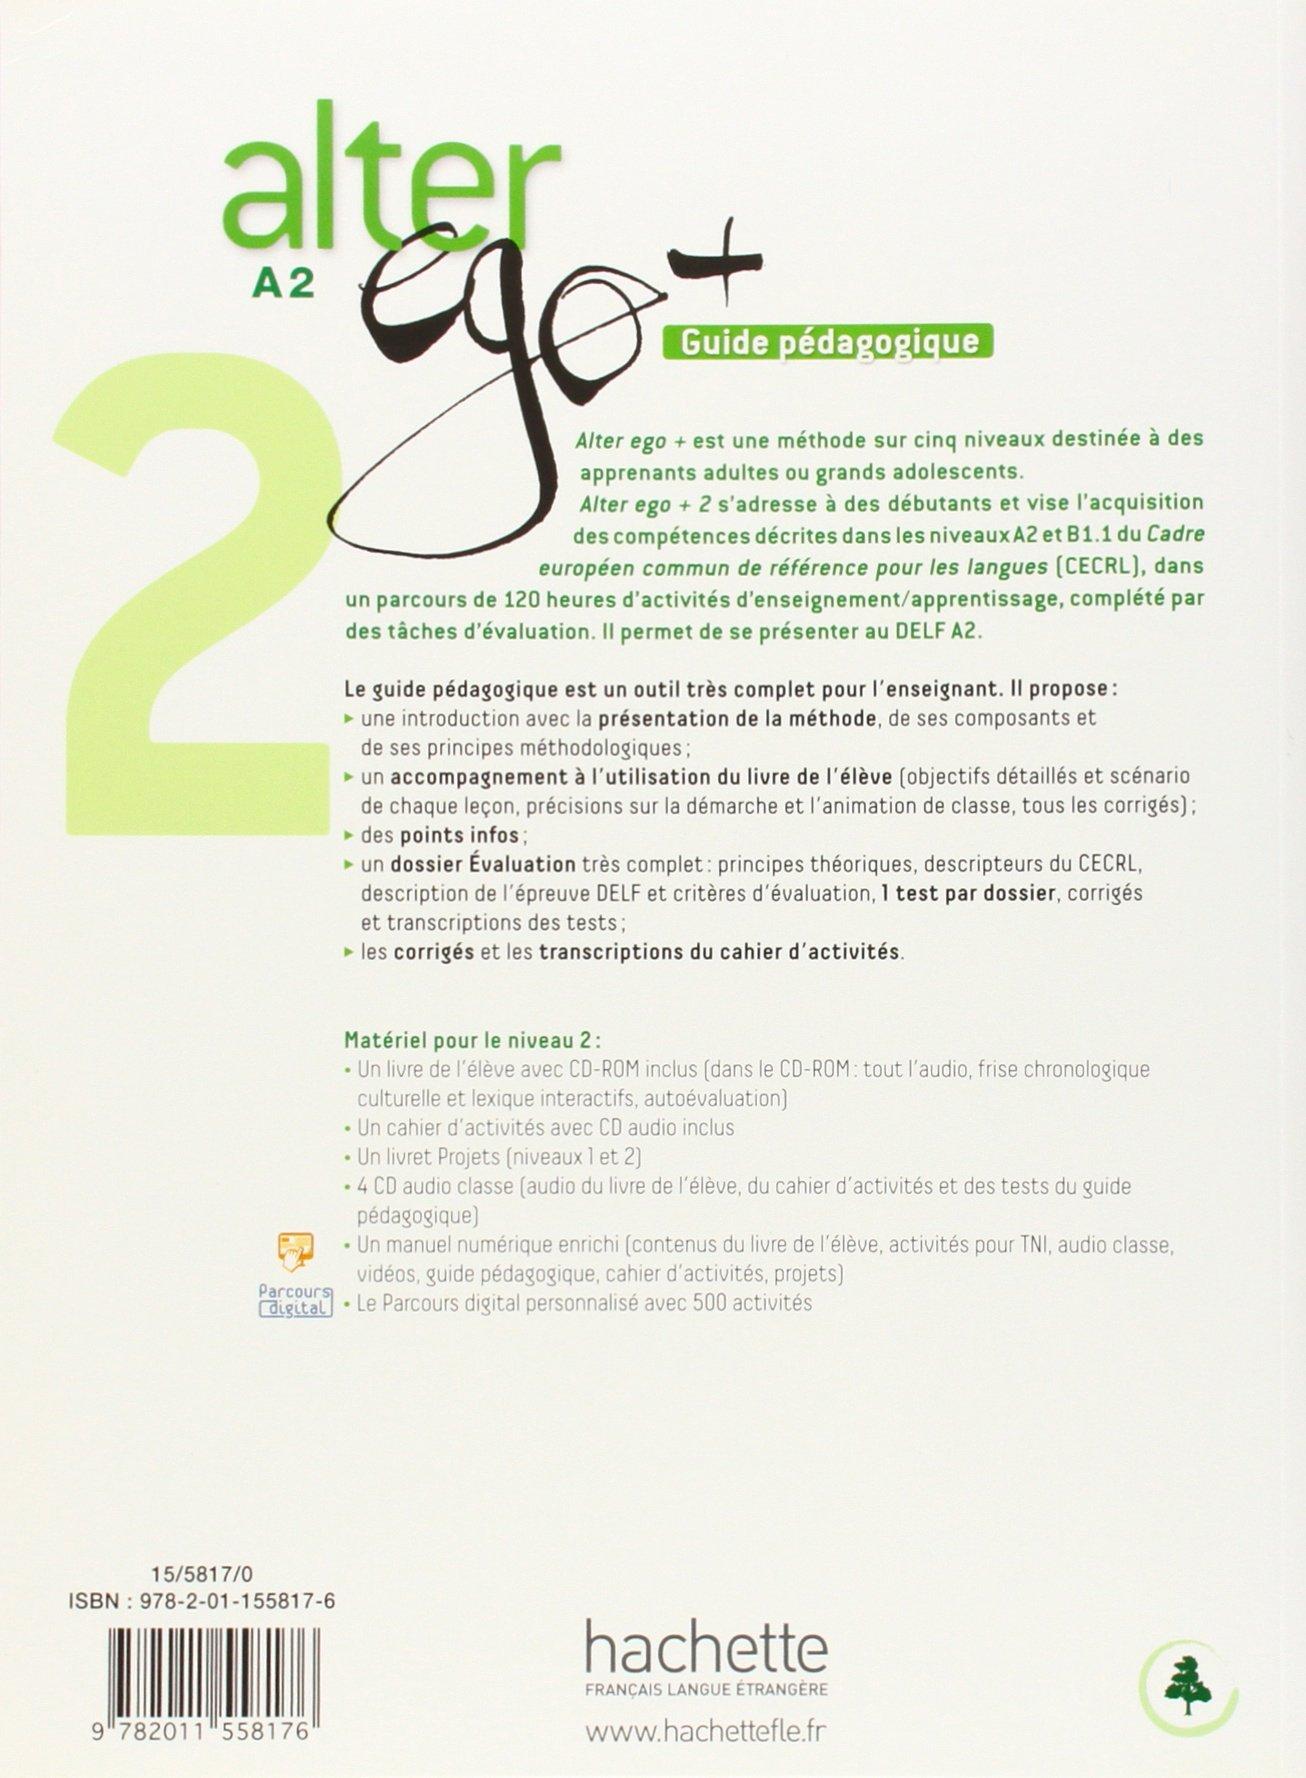 alter ego 2 guide pdagogique french edition annie berthet rh amazon com Alter Ego Dangan Ronpa Alter Ego Drawings